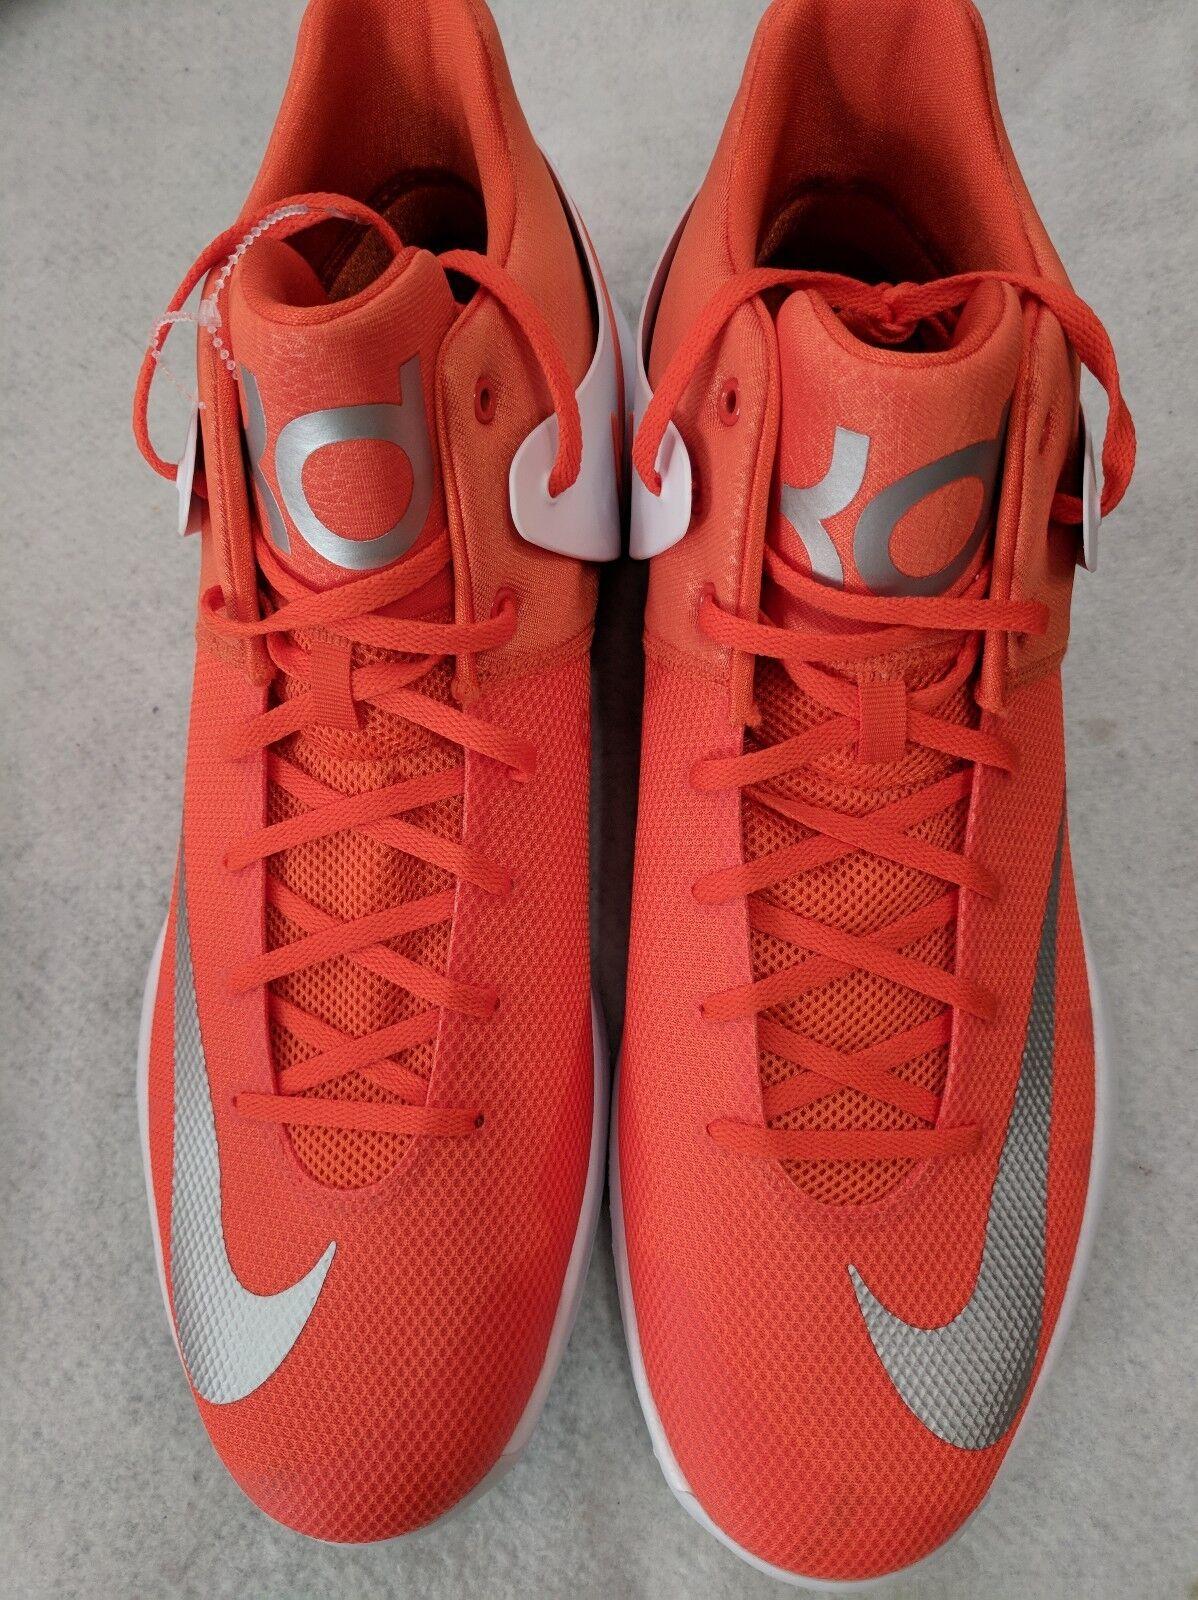 Nike KD Kevin Durant Basketball Shoes Orange White 856484-883 Mens Size 17 Trey5